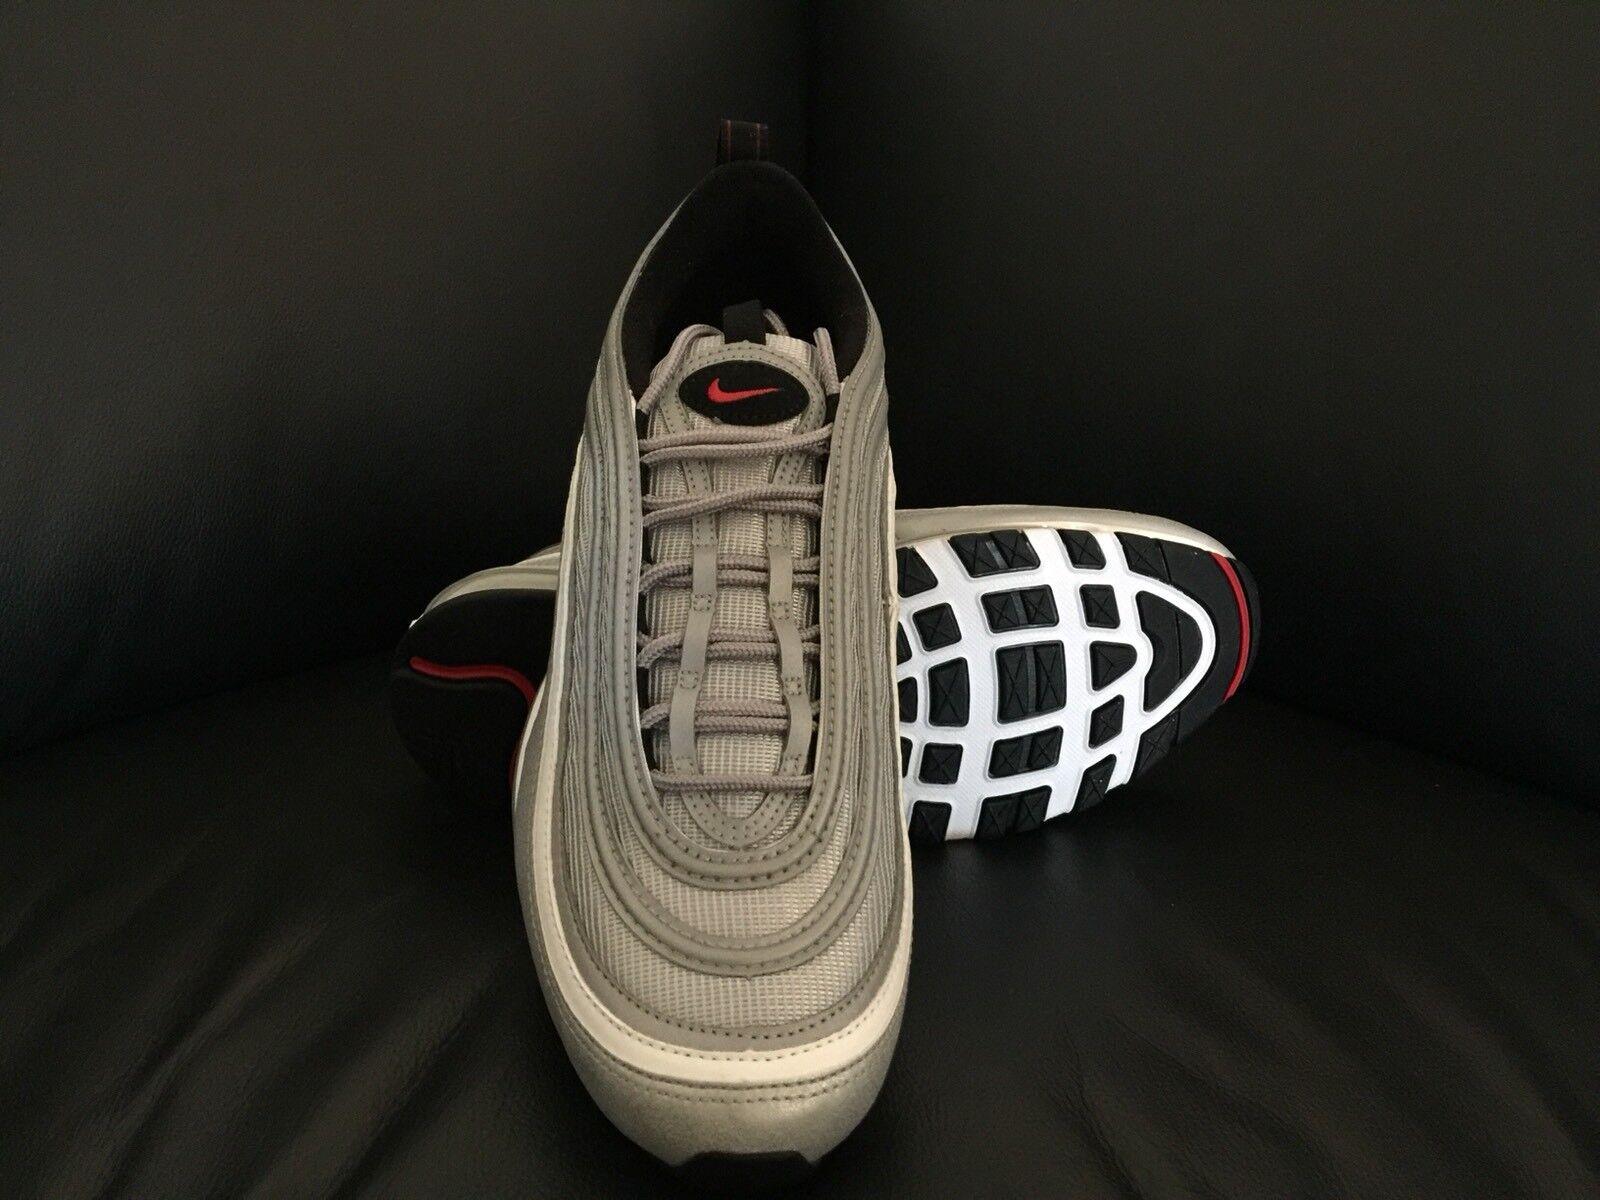 Nike Nike Nike Air Max 97, Silver Bullet, (884421-001), 10 US 45a27e